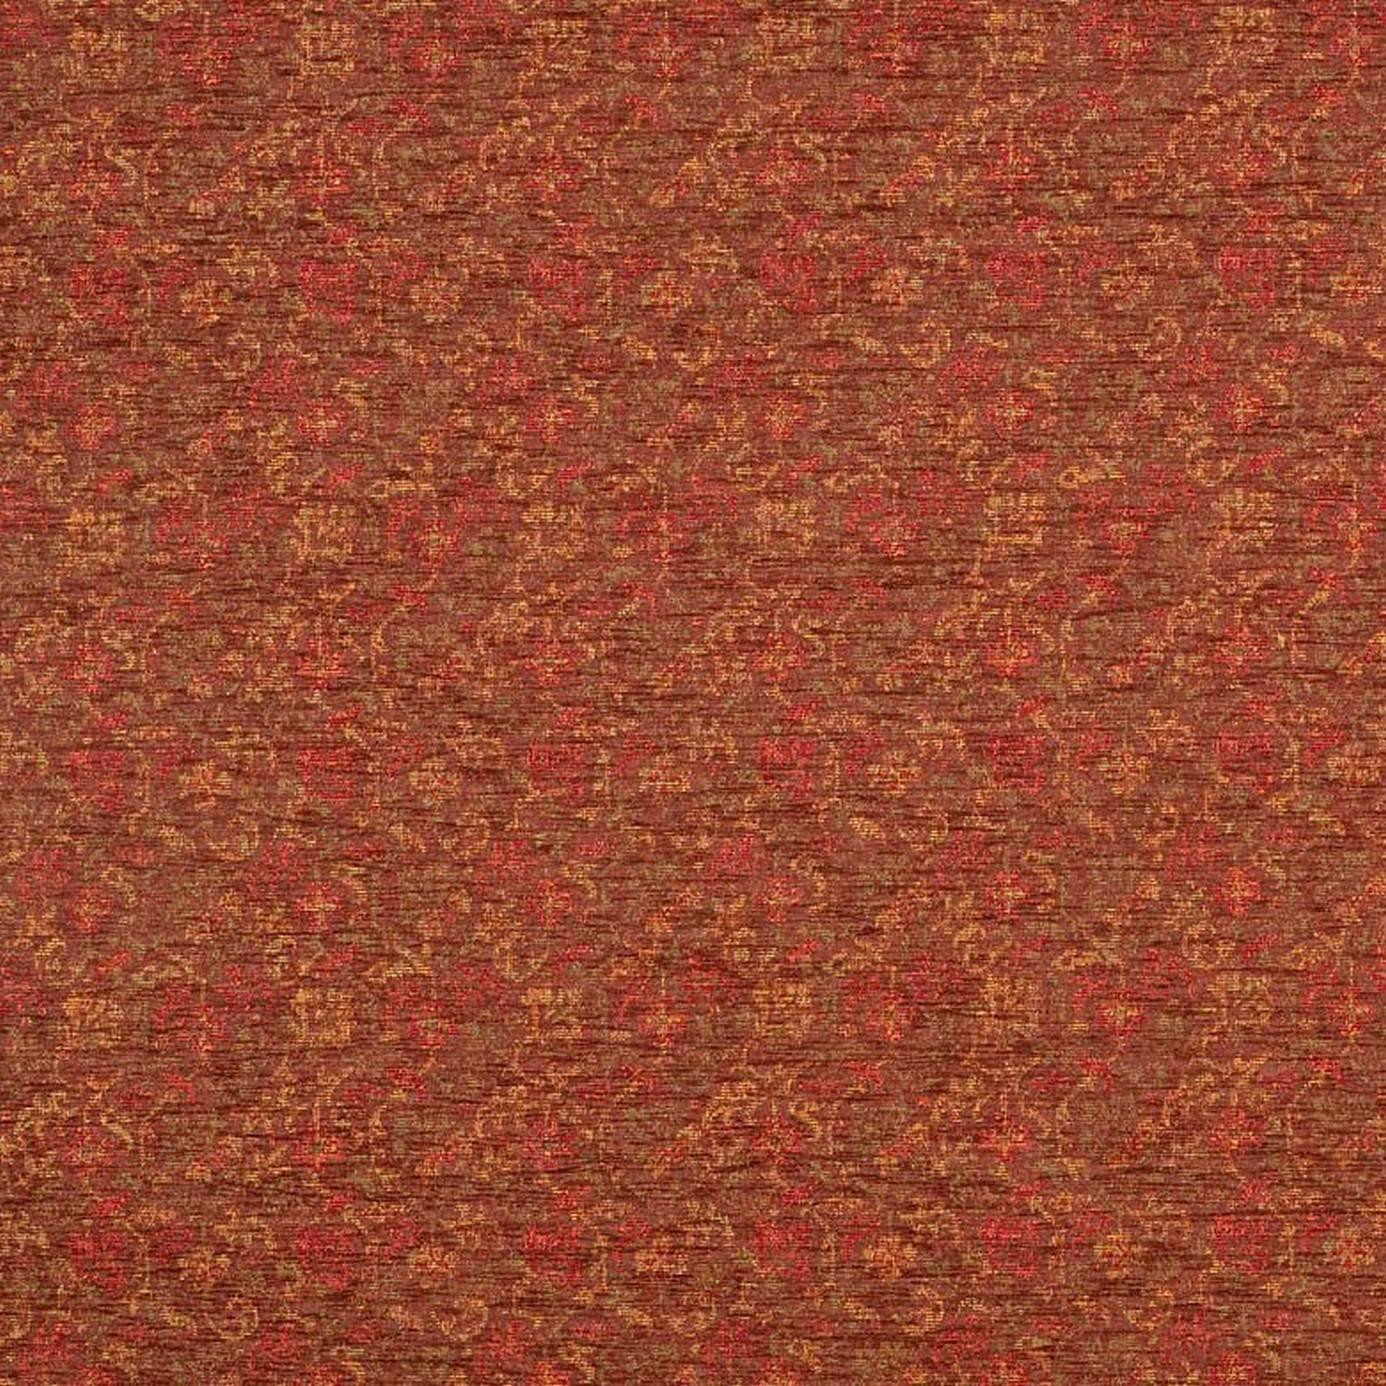 Arras Fabric Antique Arrasantique Warwick Legacy